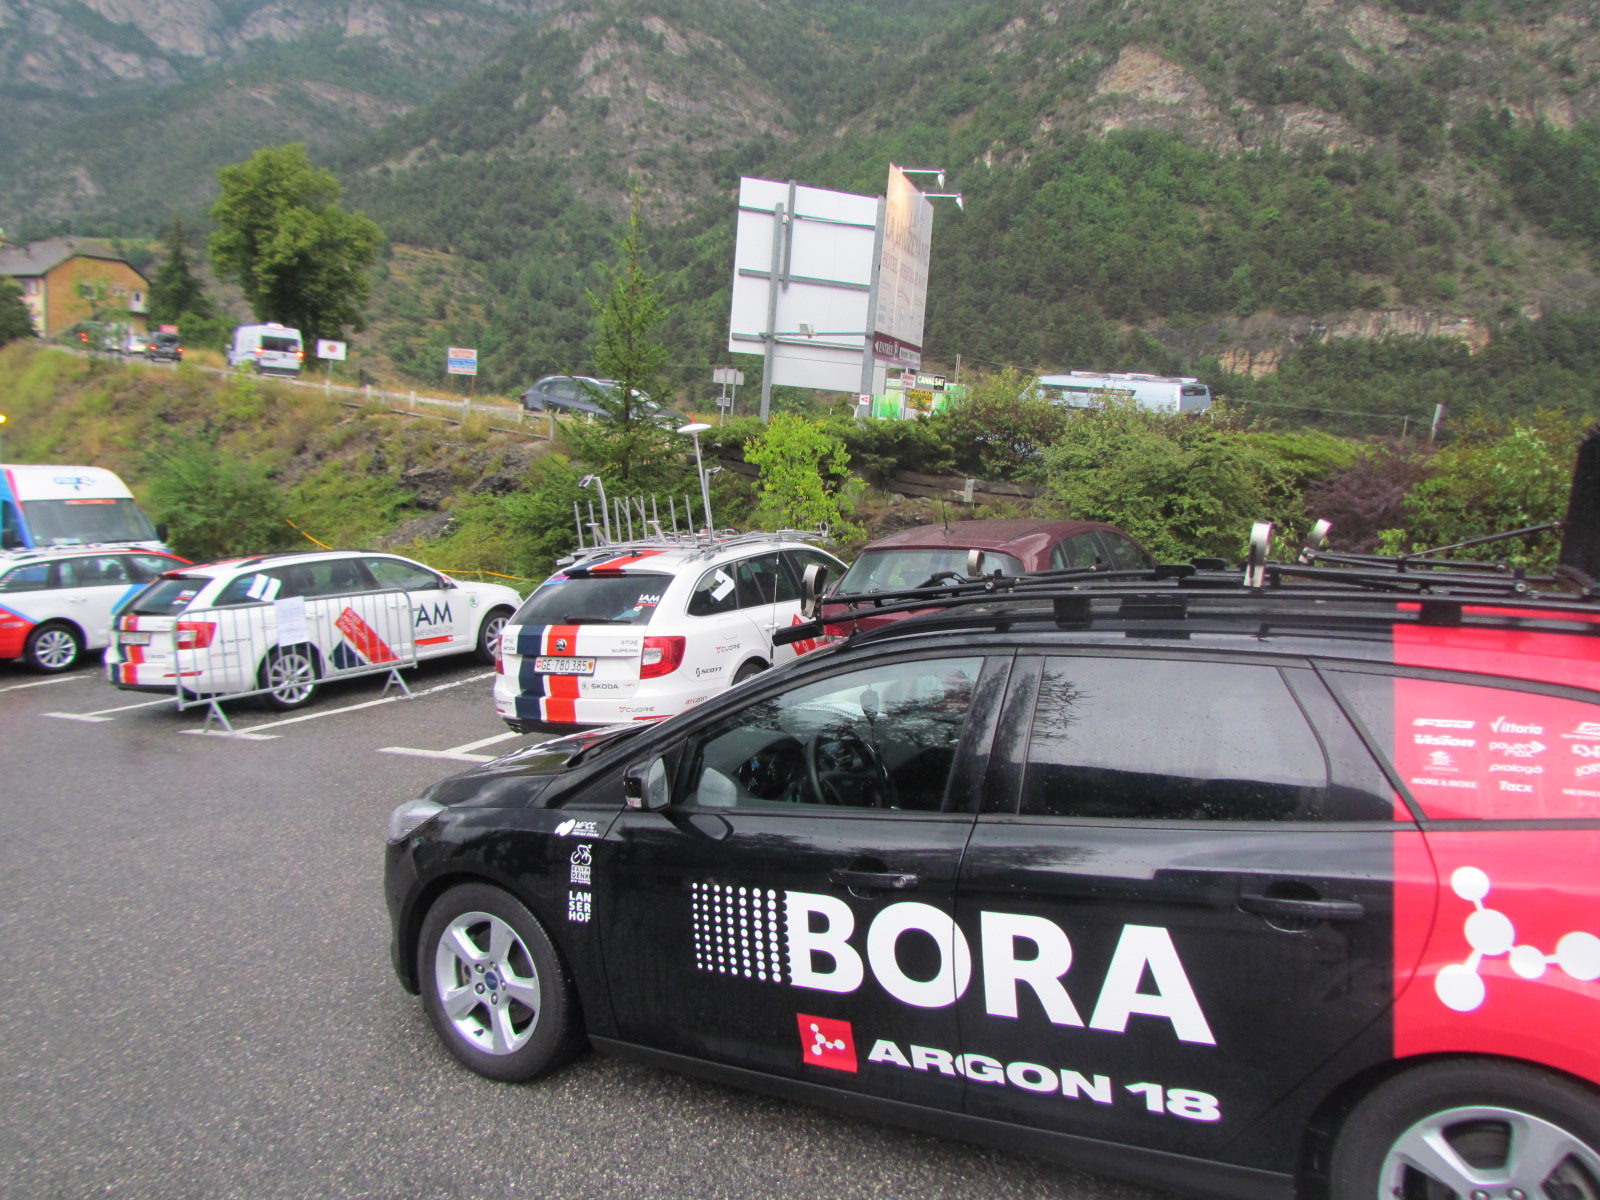 Team Bora